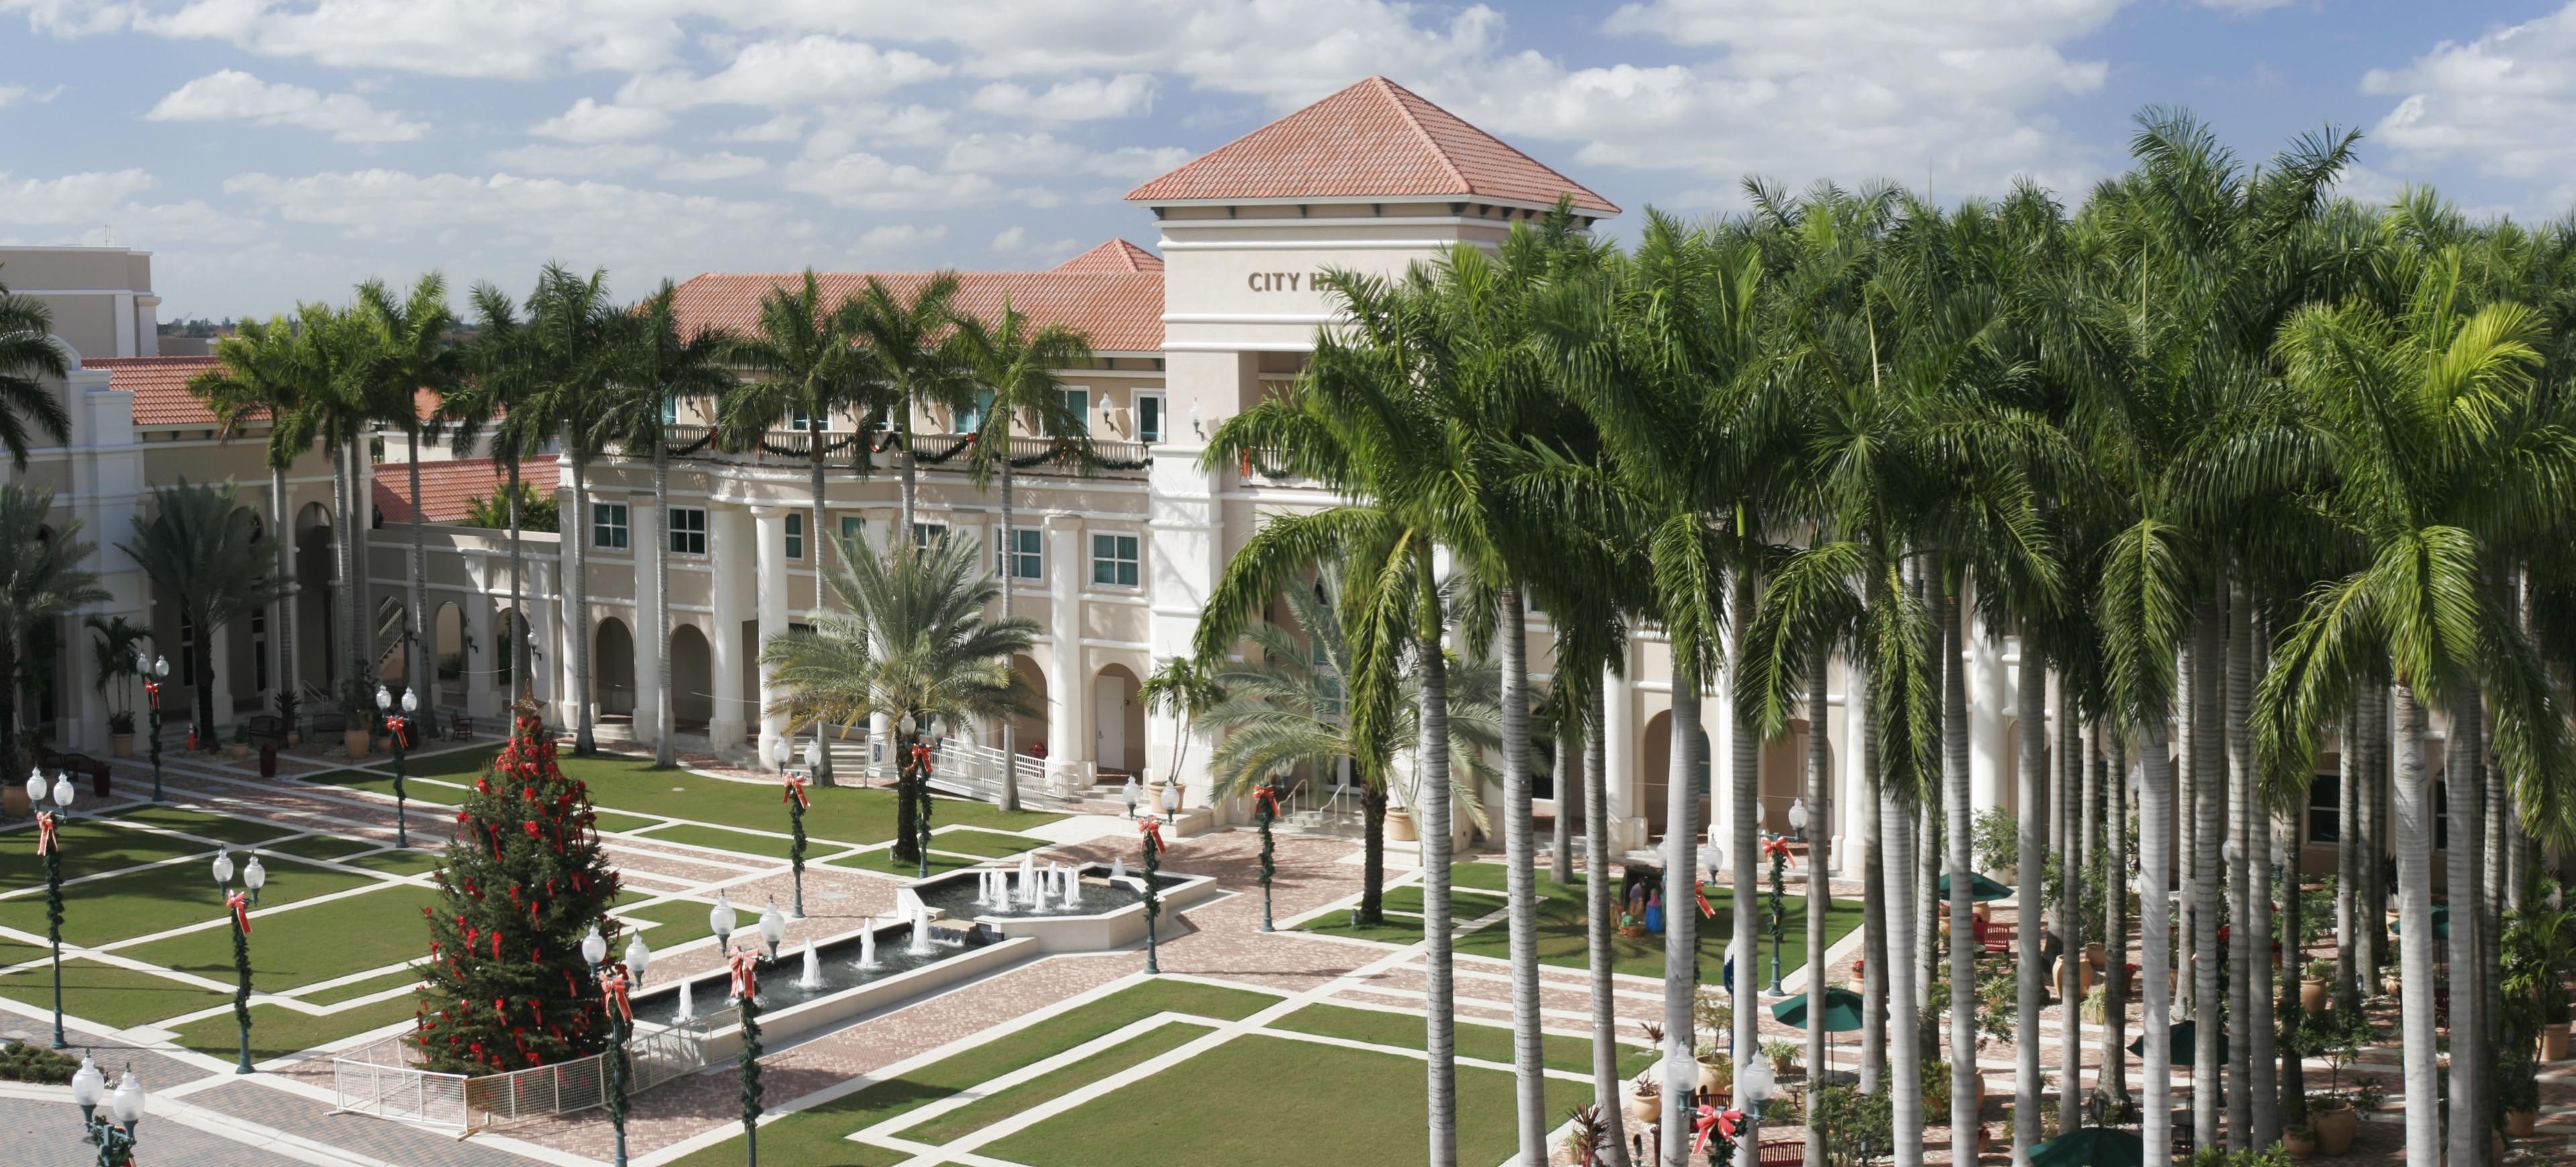 Royal Palm Beach, Florida, USA